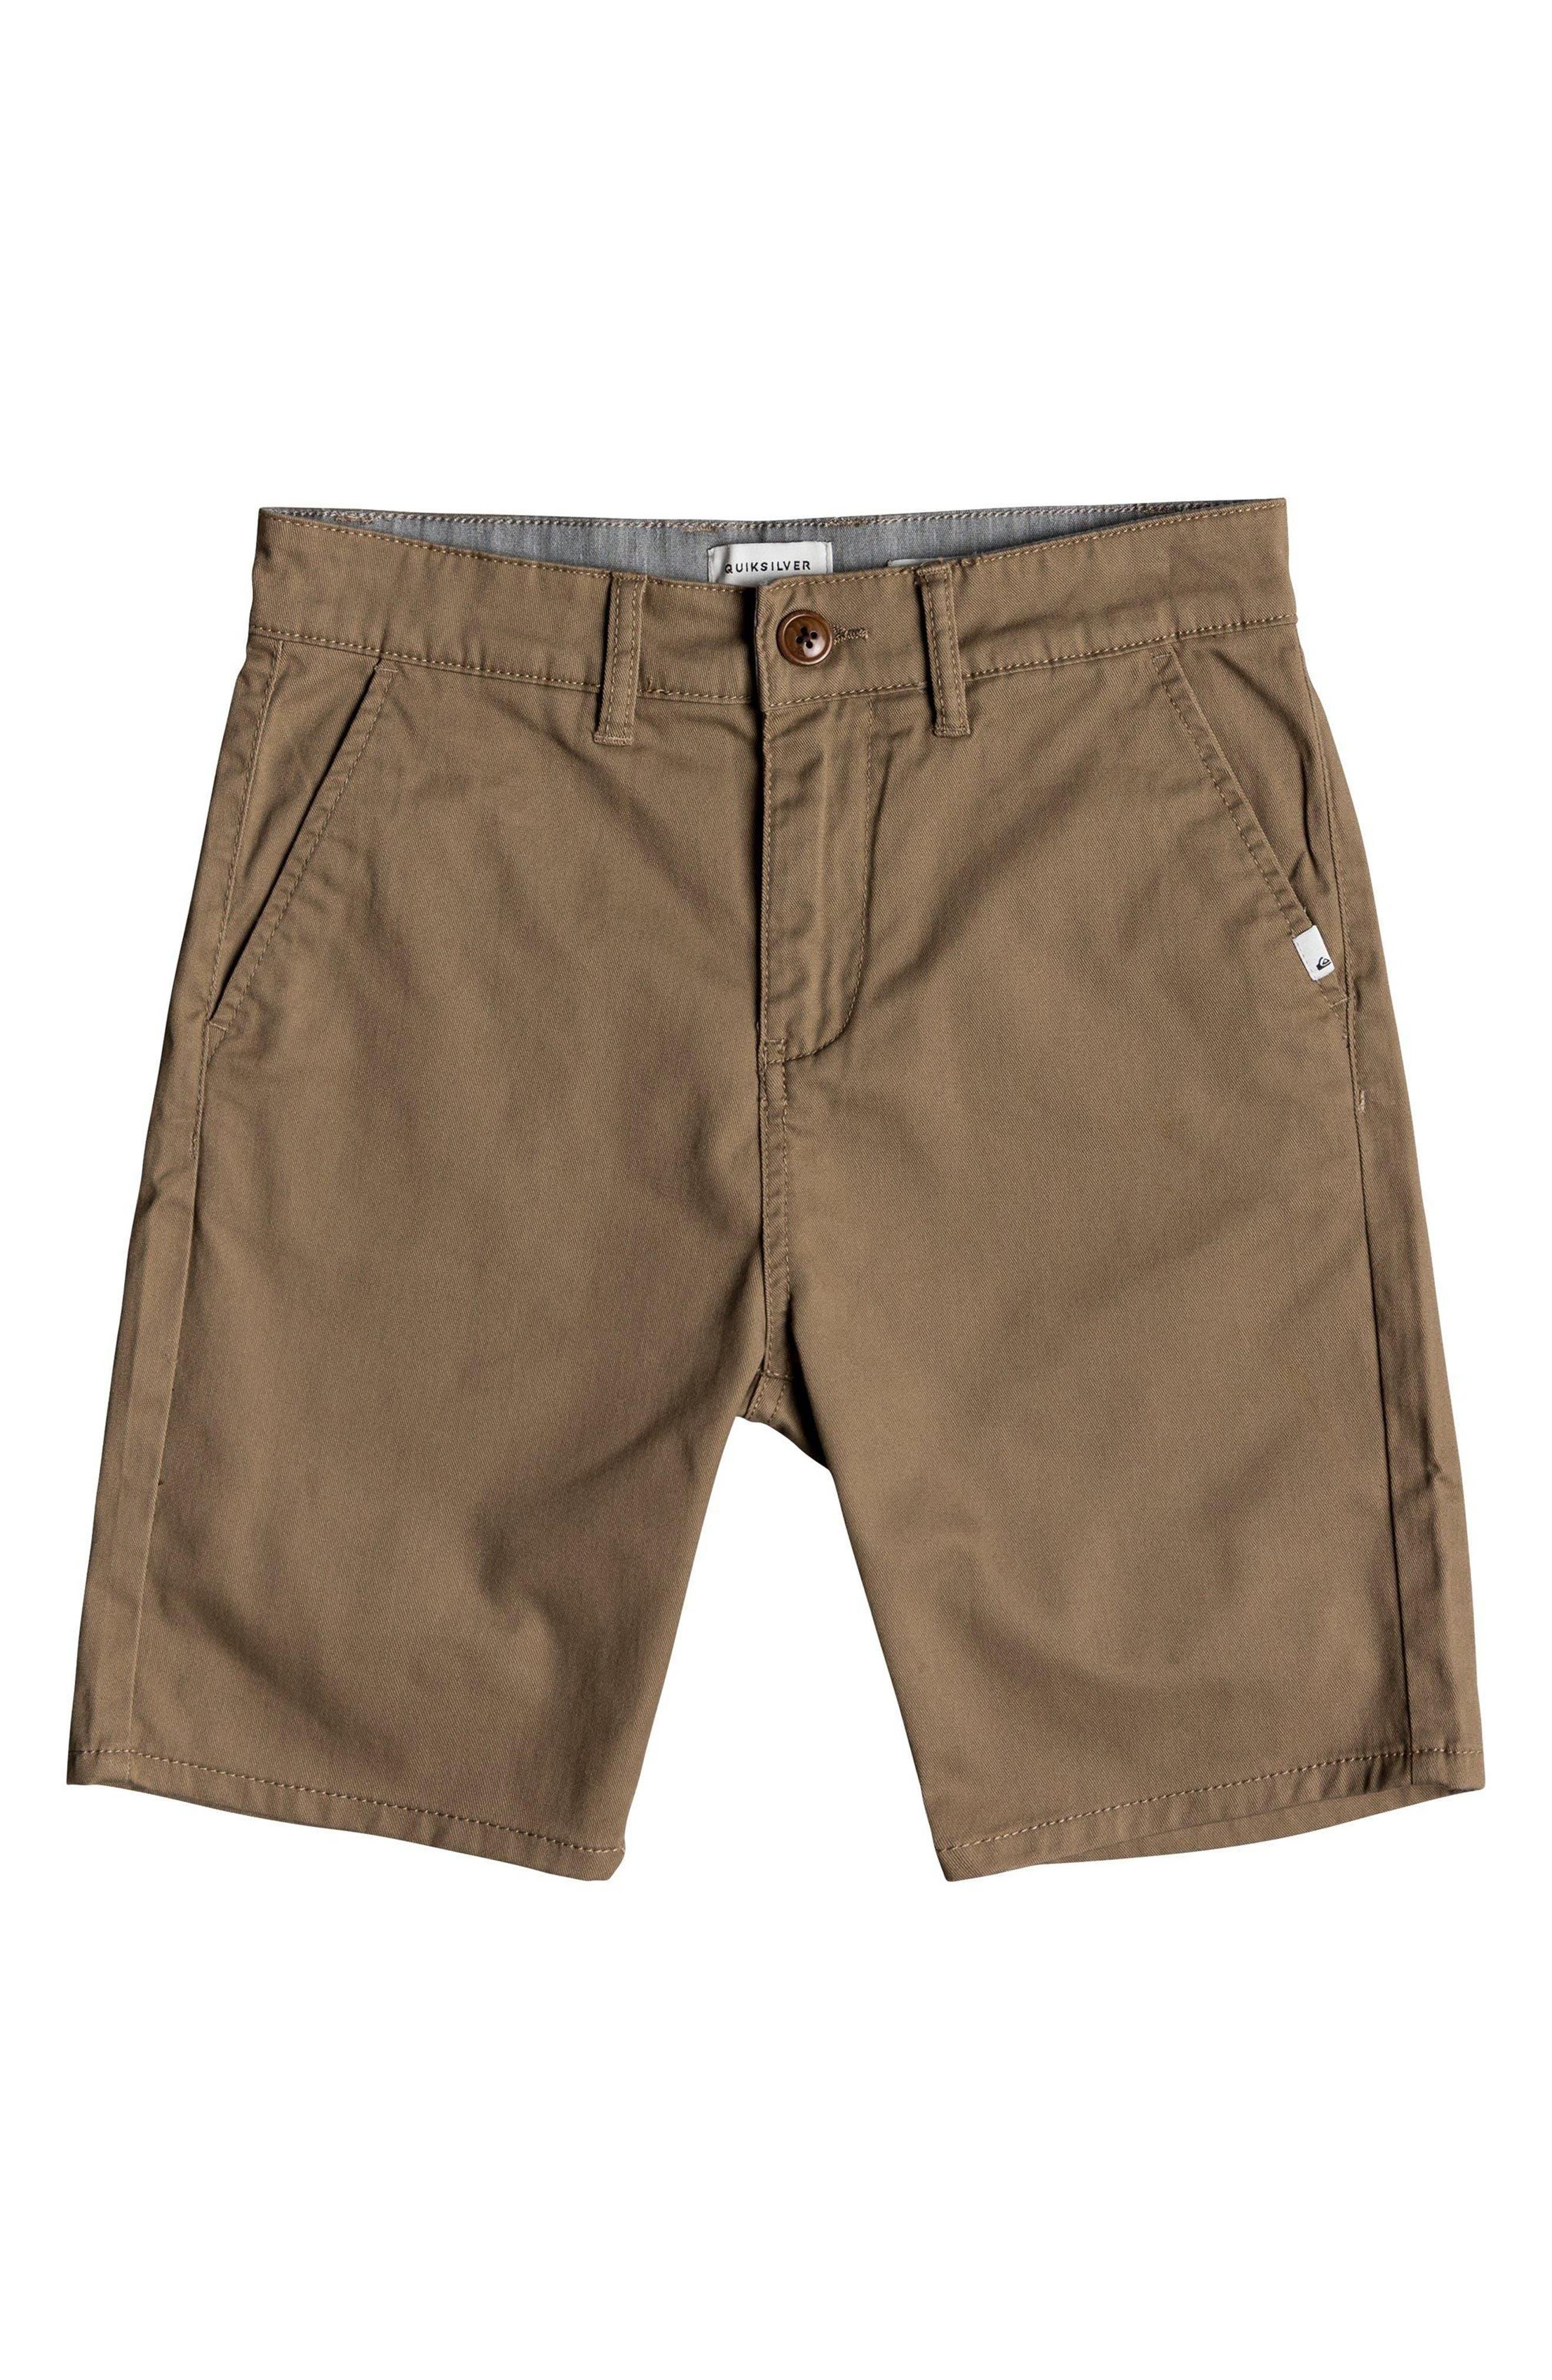 Boys Quiksilver Everyday Union Stretch Shorts